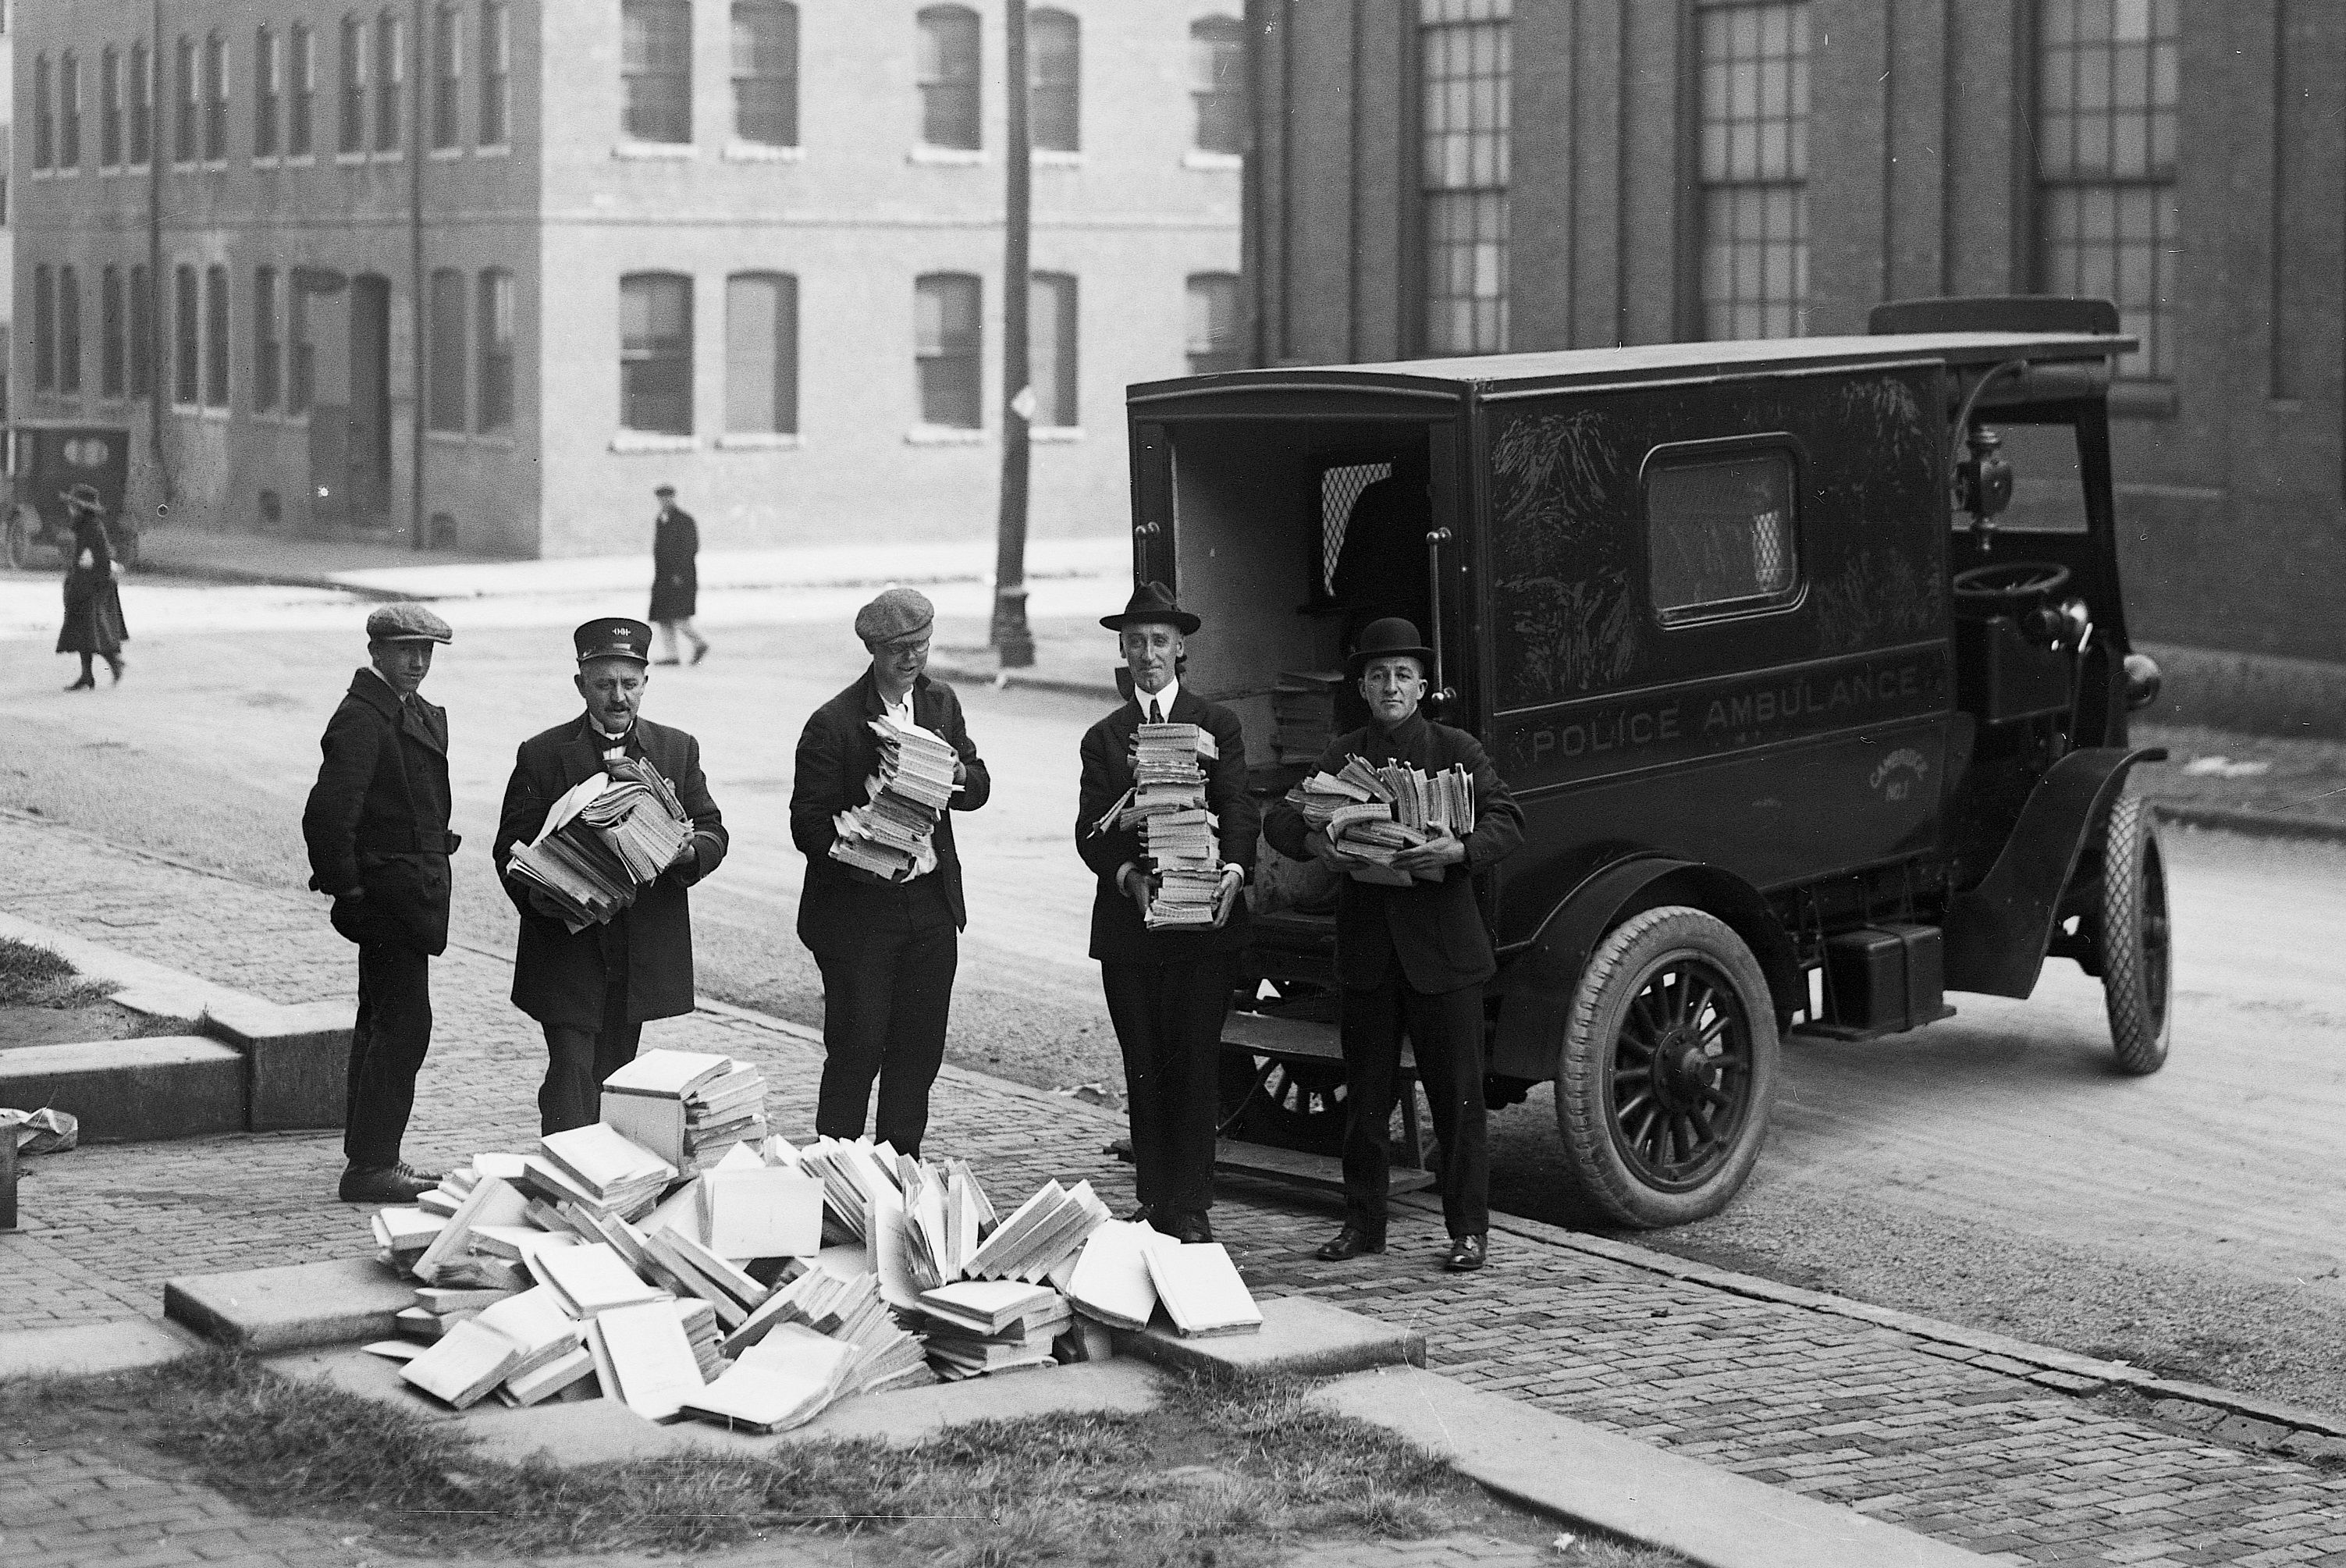 Boston Police pose with seized radical literature.